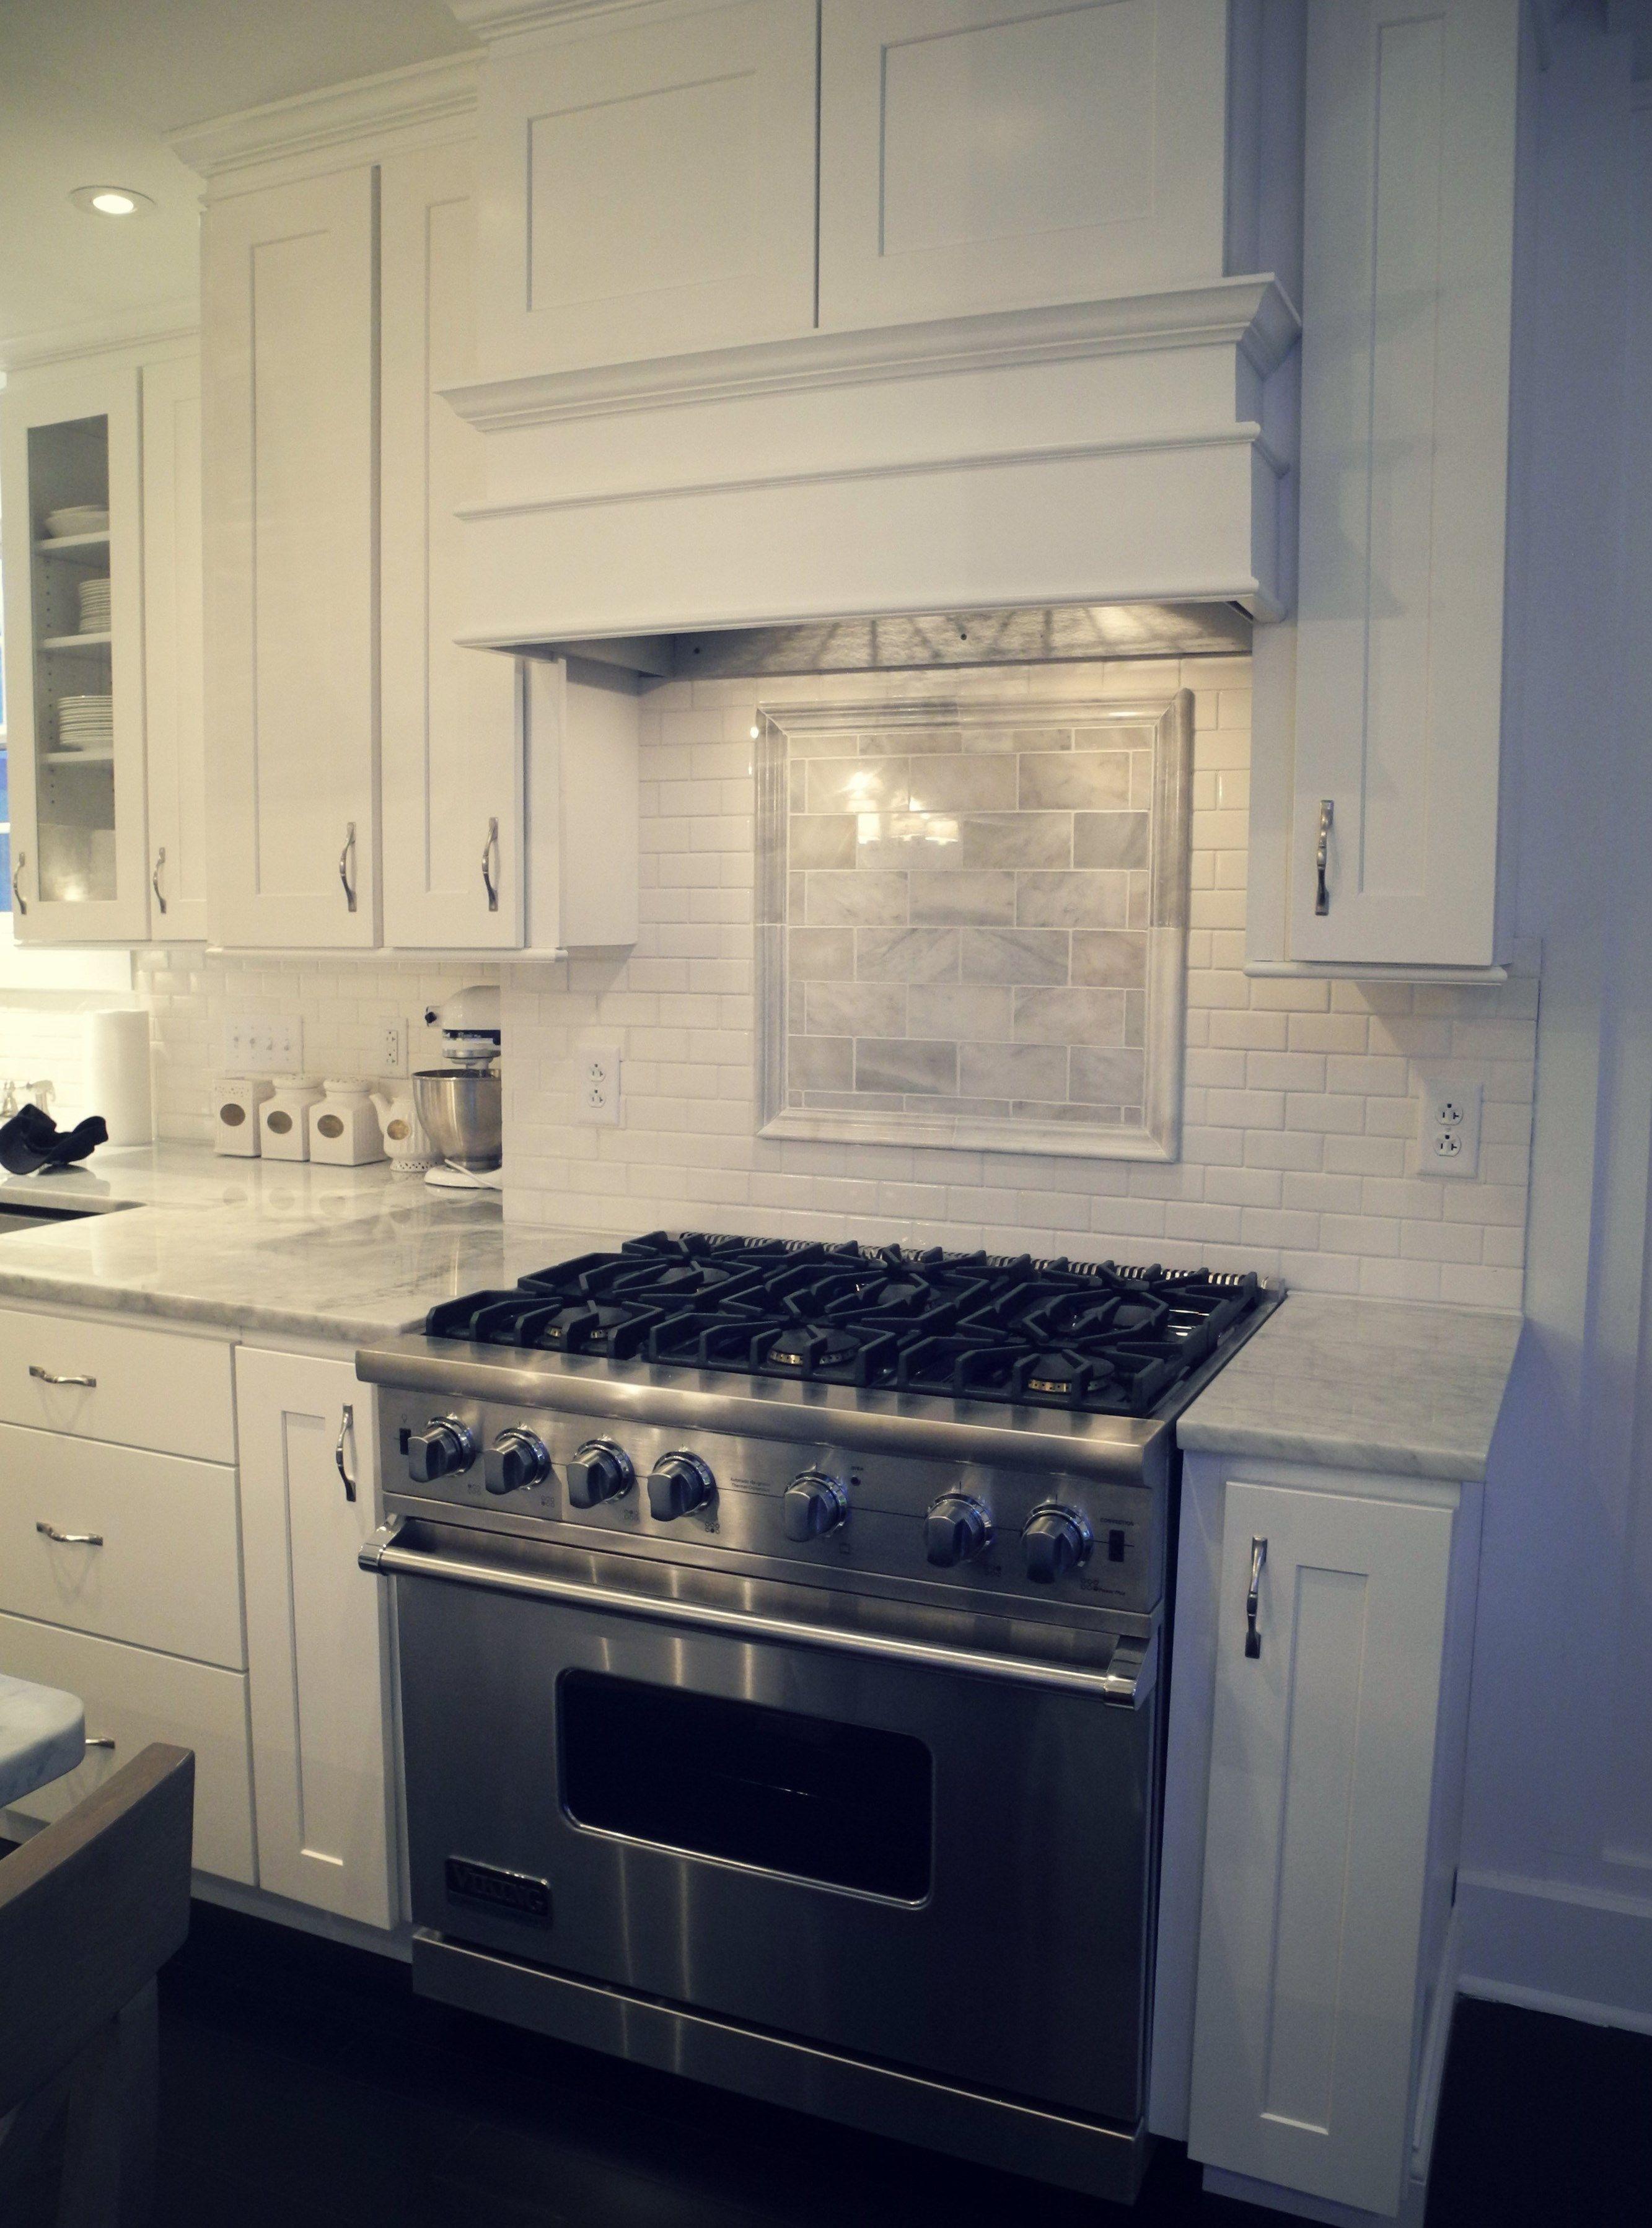 Viking oven, white kitchen, Carrera marble counters